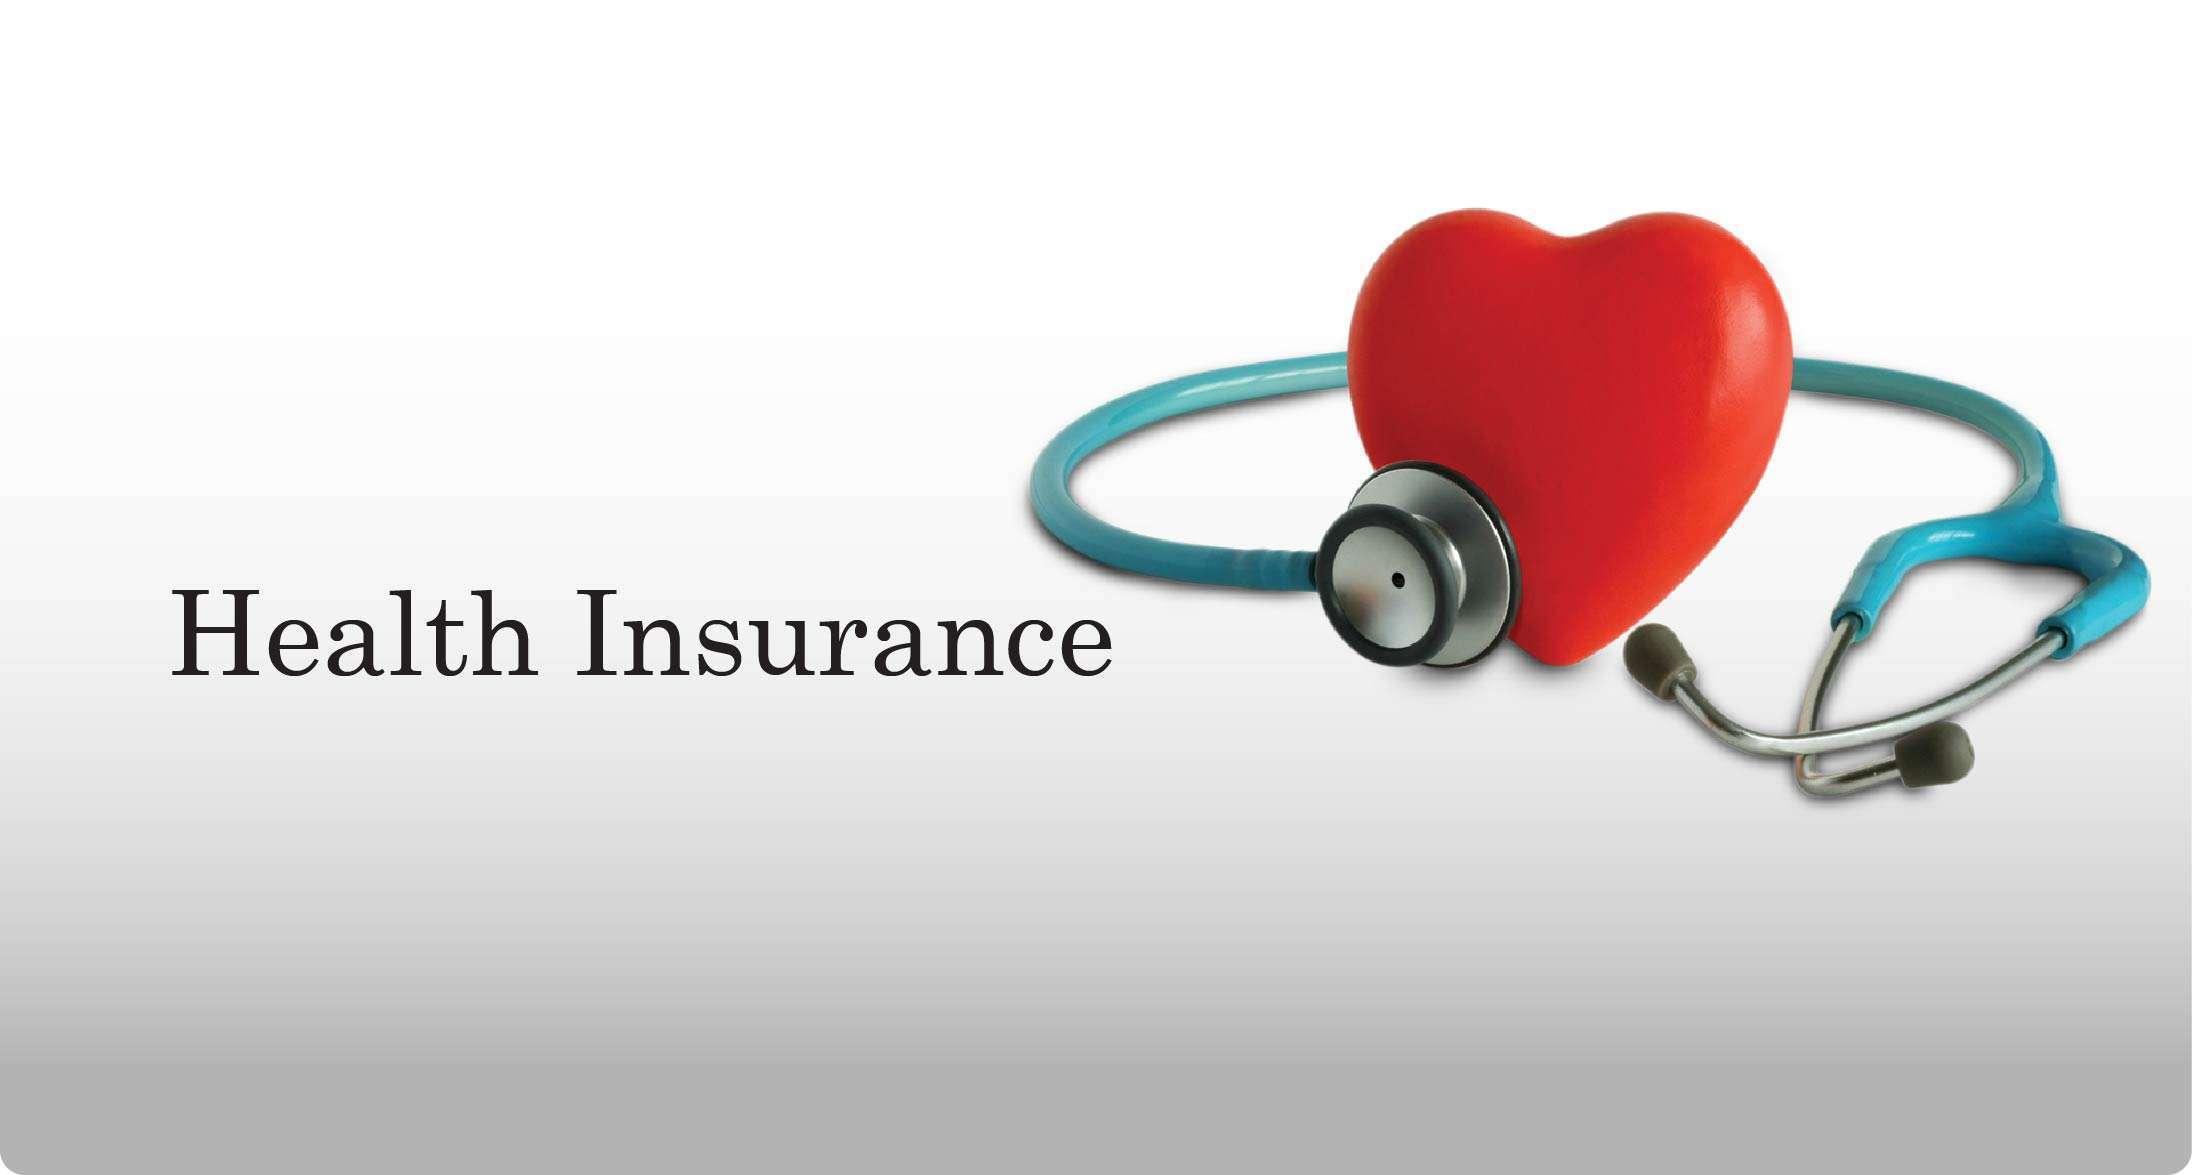 Health Insurance Hd Wallpaper   Health Insurance Images Hd 2192x1175